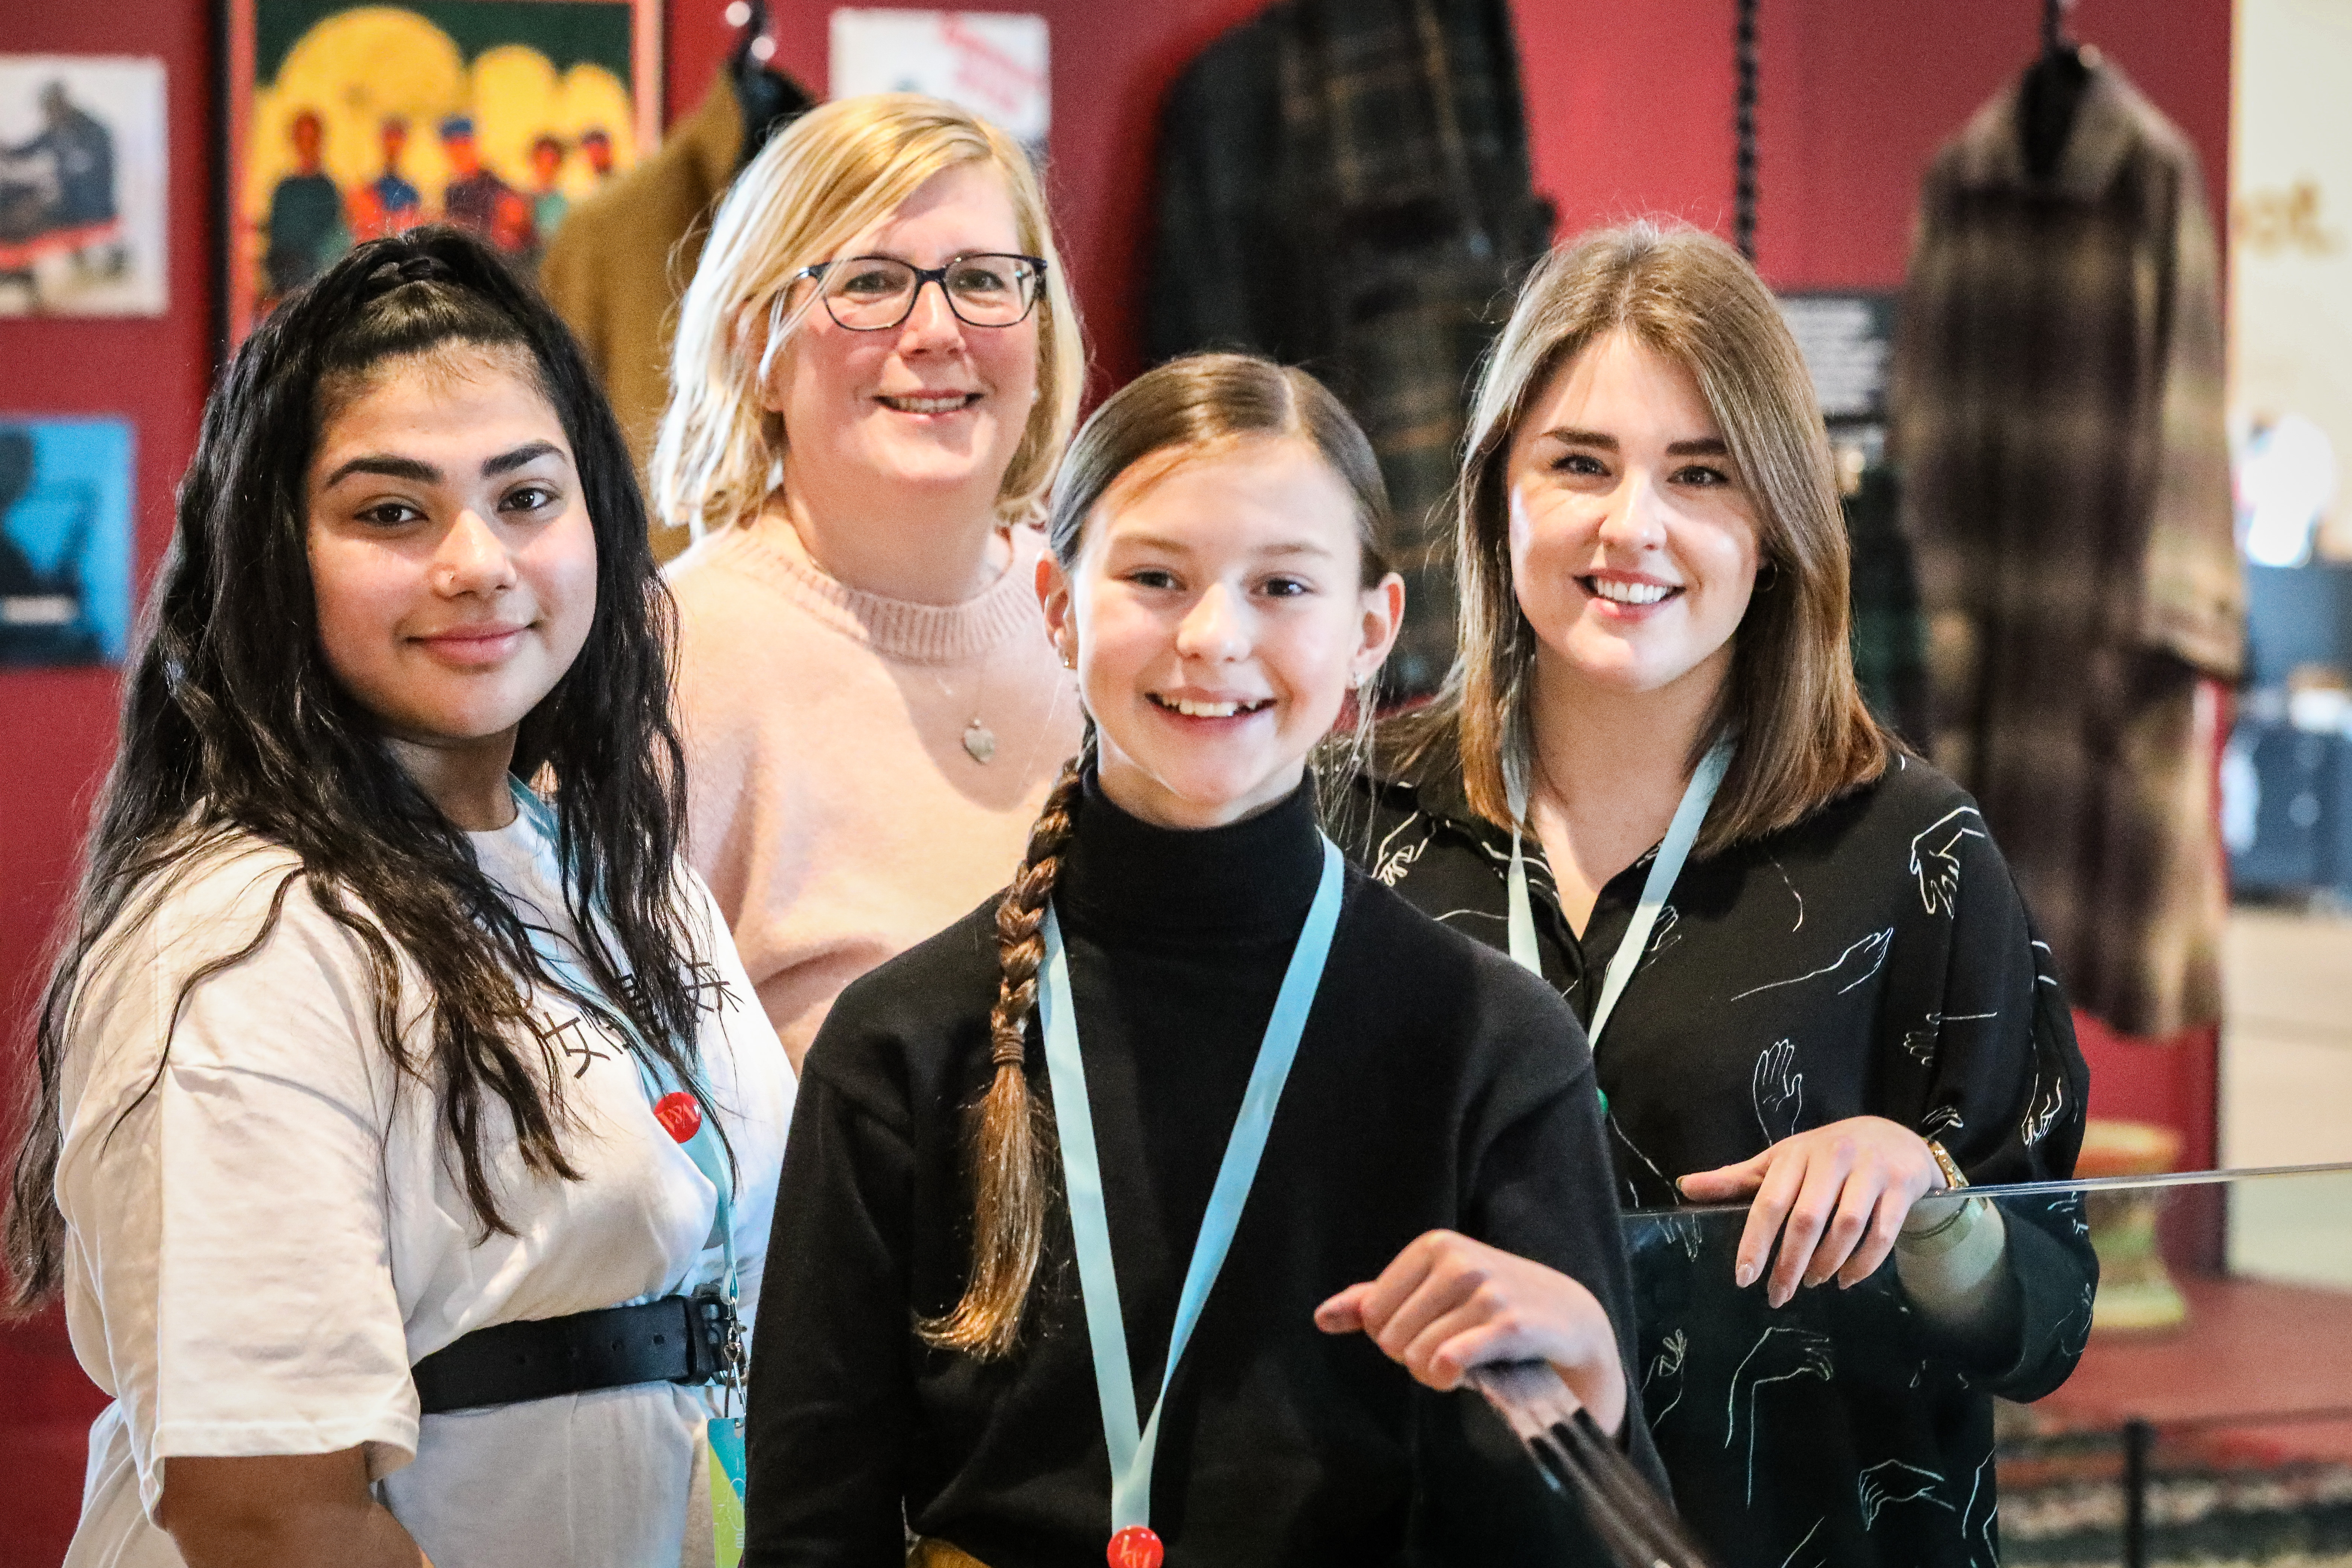 Aqsa Kahn S2 Morgan Academy, Yvonne Anderson, Arbroath High STEM club, Keira Beattie, S1 Arbroath High and Judith Steele, Art and Design, Morgan Acad at the Design Jam at V&A Dundee.